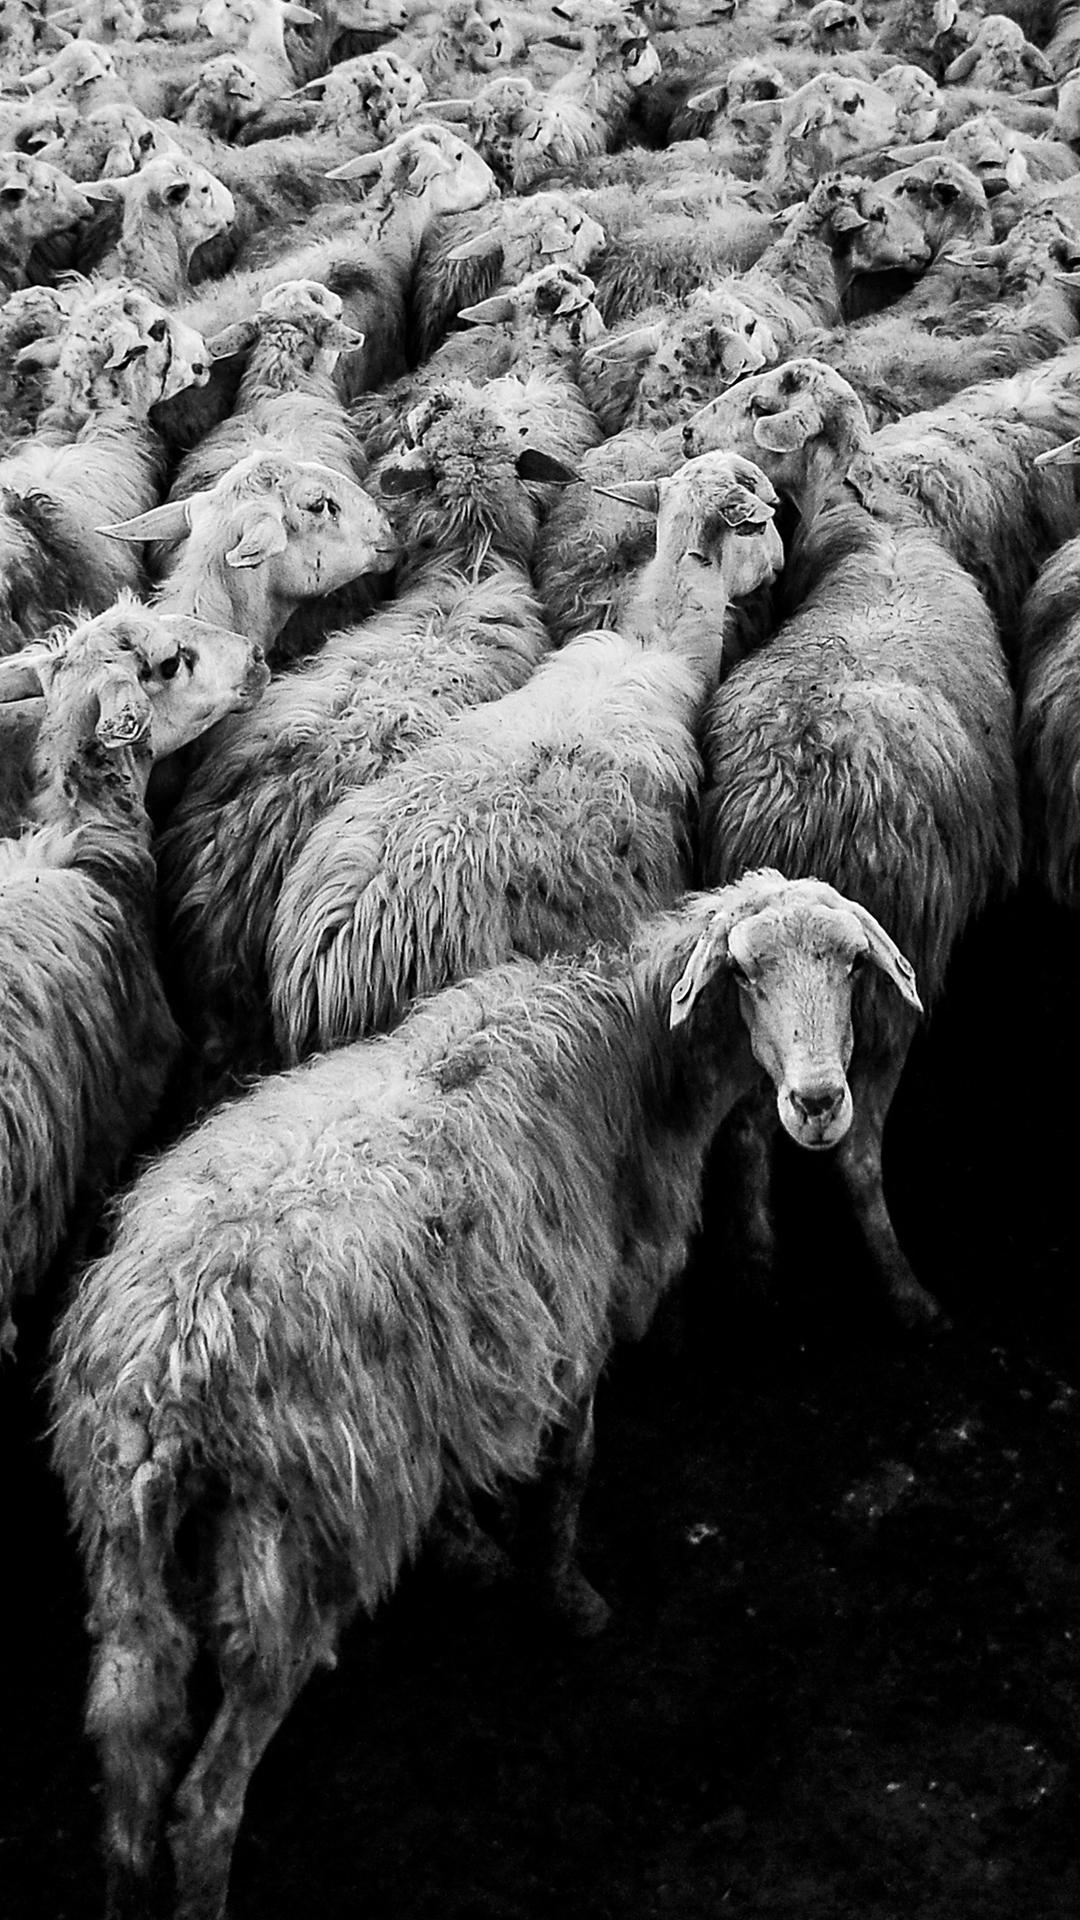 sheep-4457